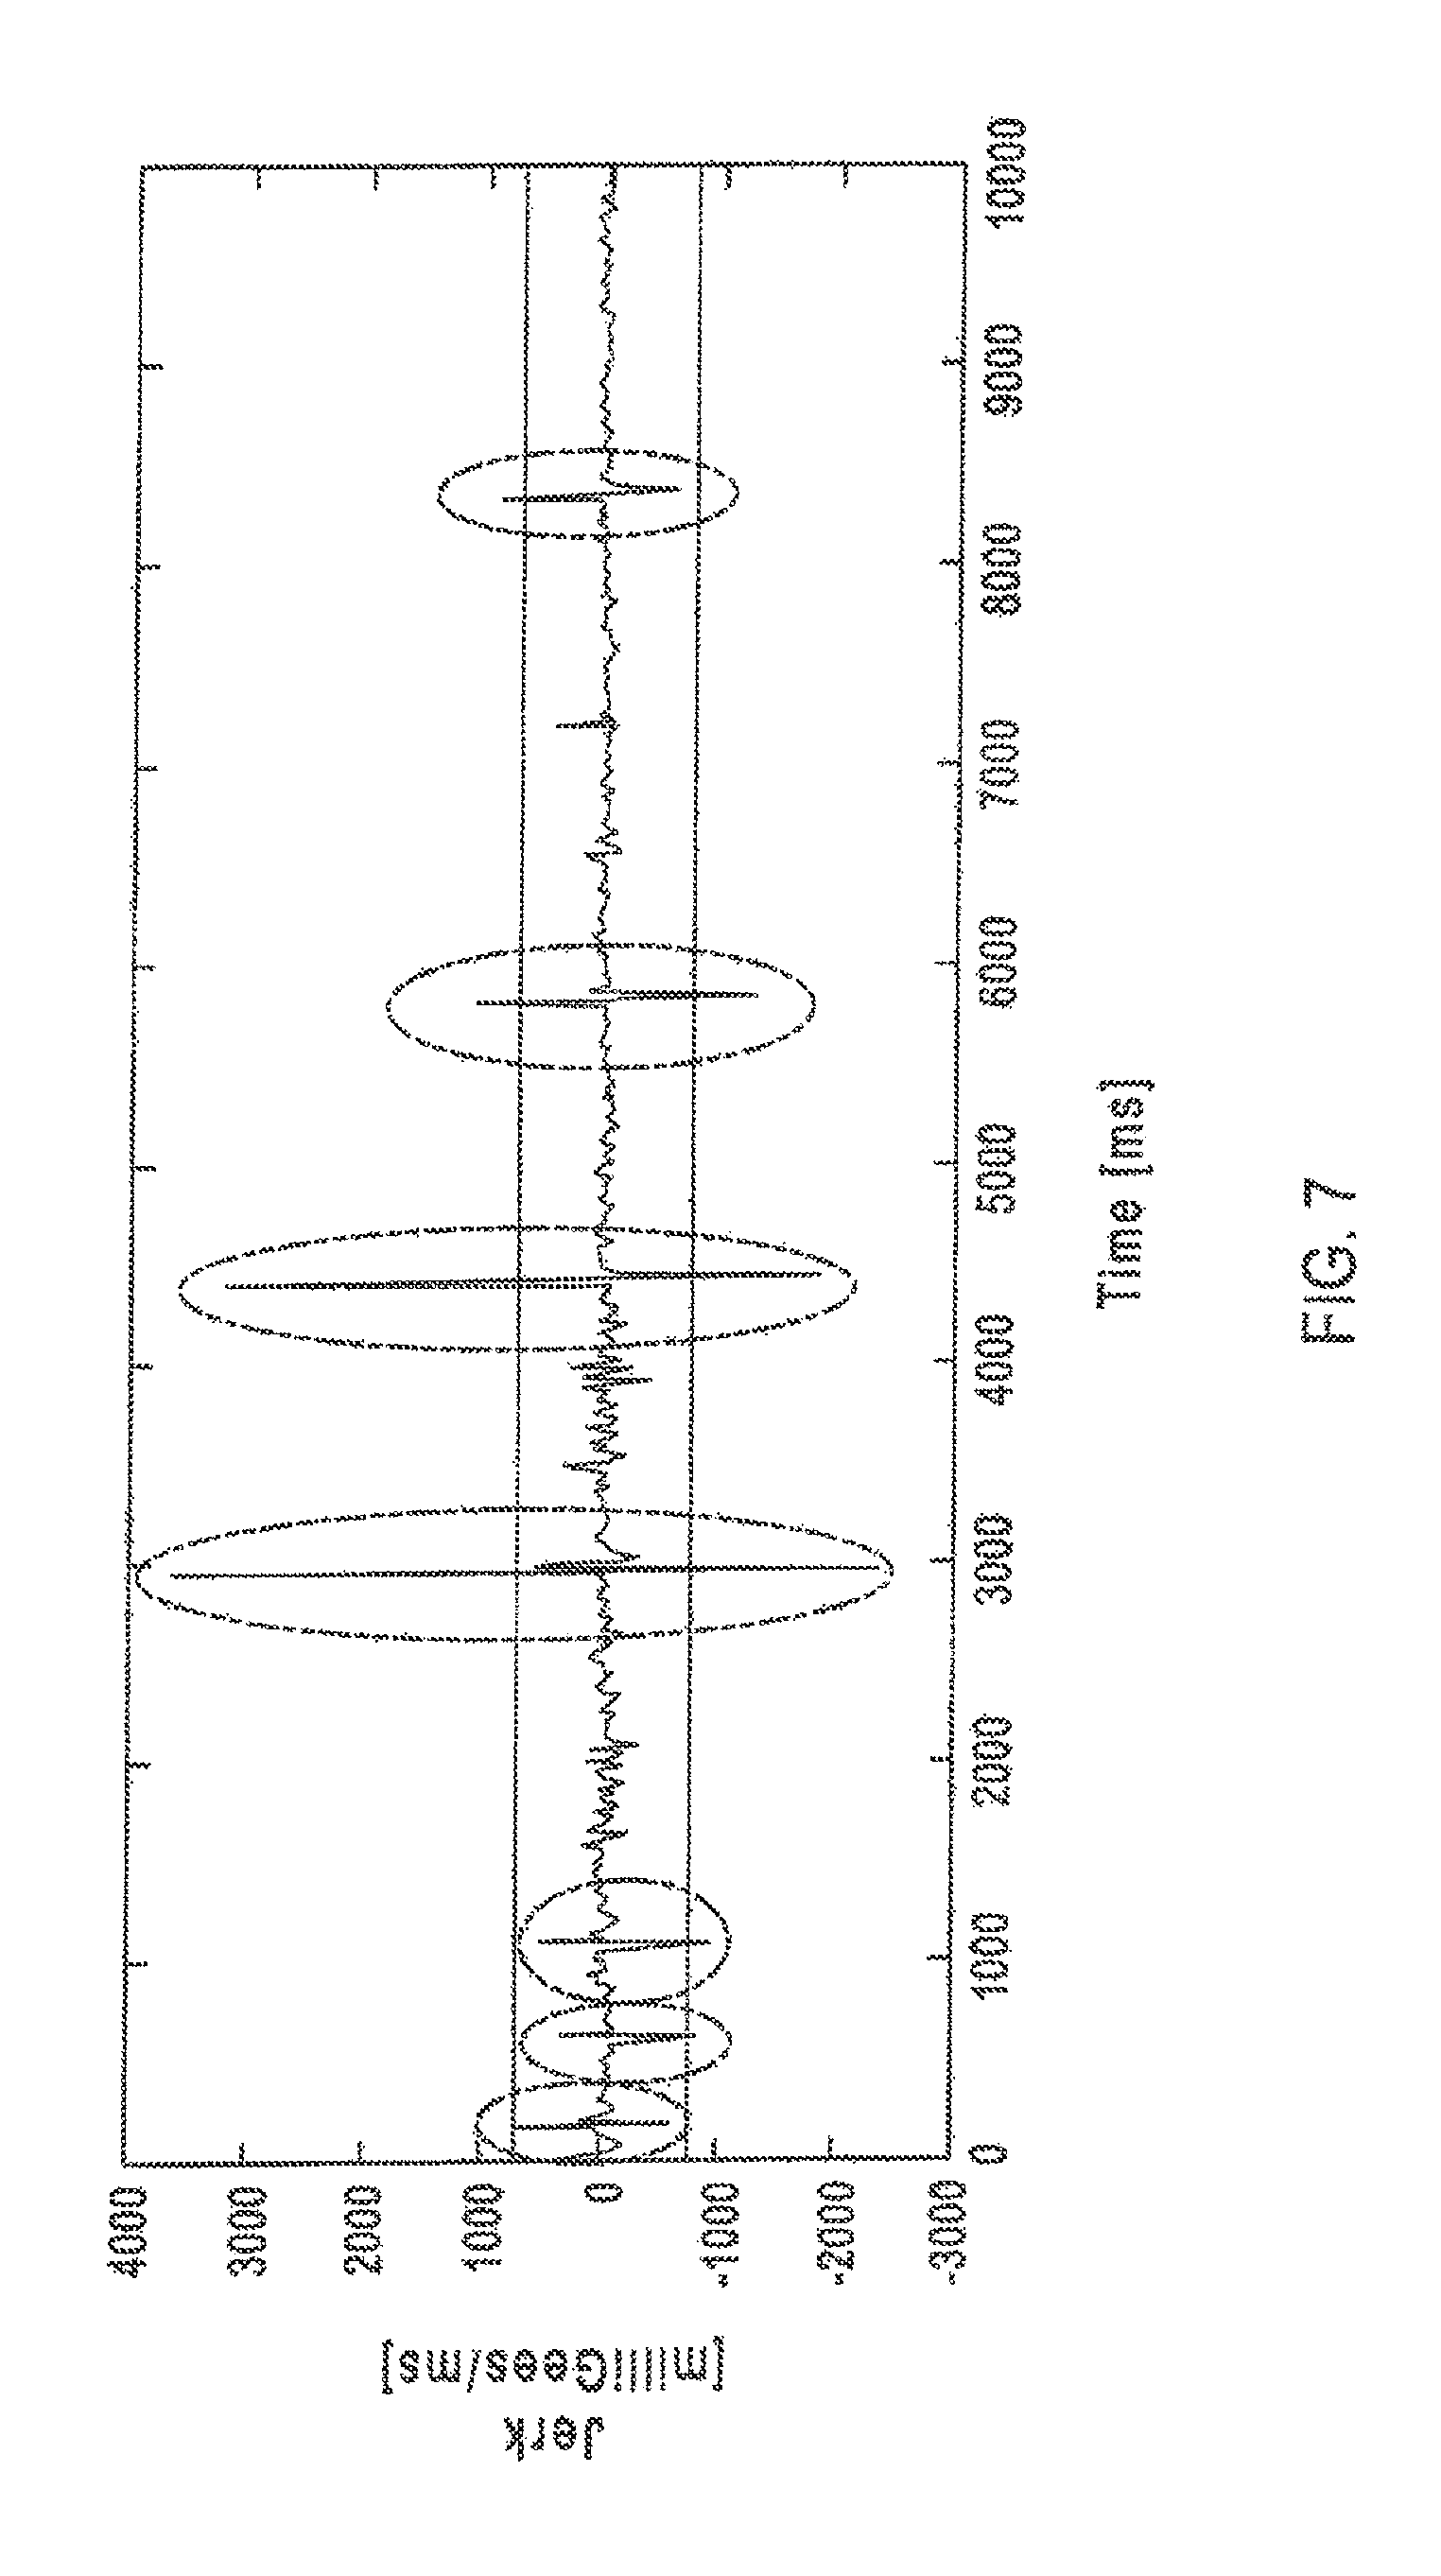 Patent US 10,058,290 B1